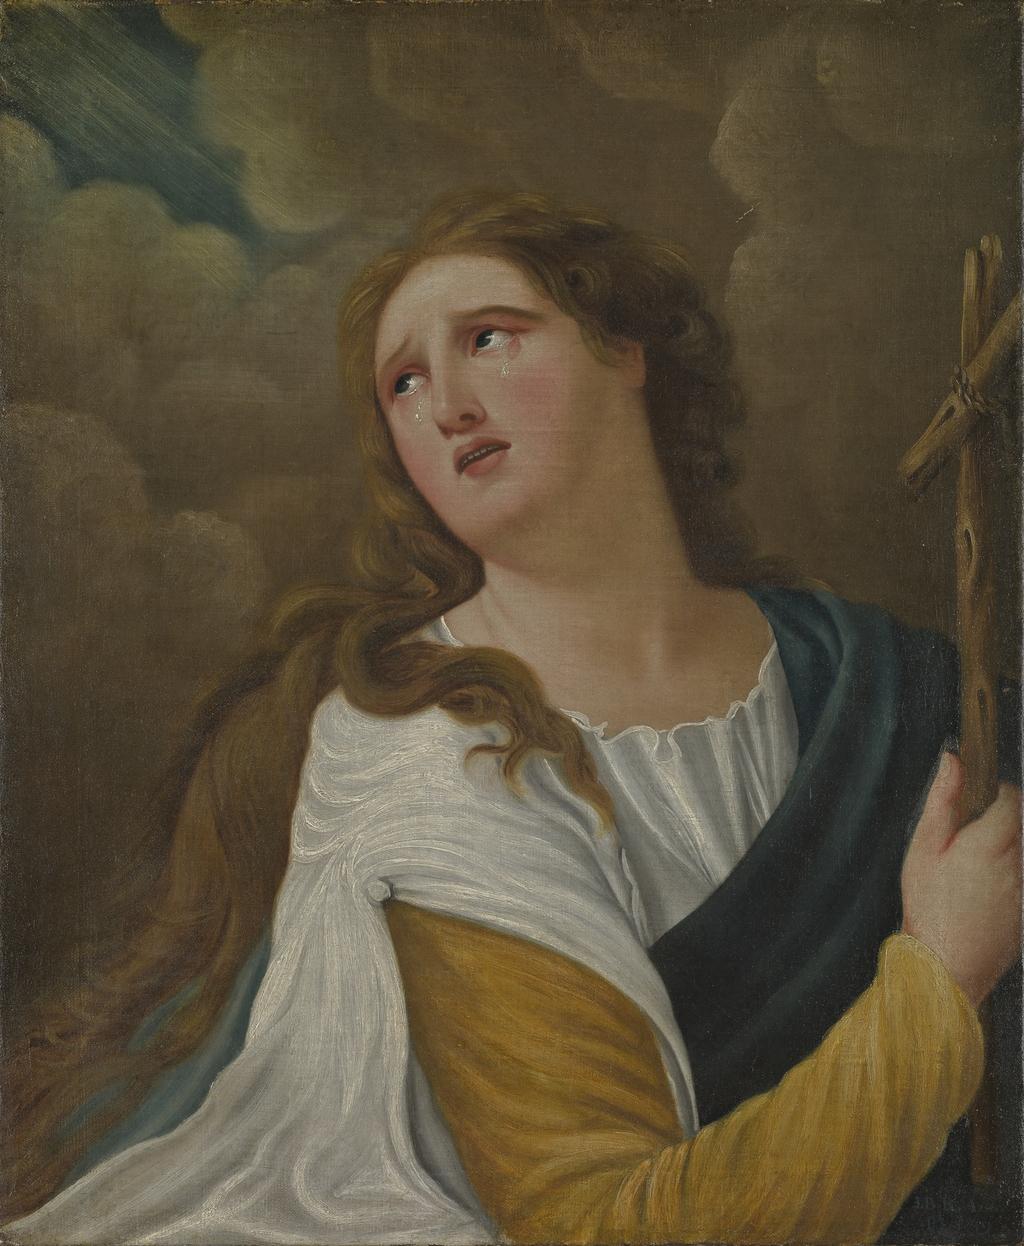 Sainte Marie-Madeleine ou La Madeleine en pleurs1